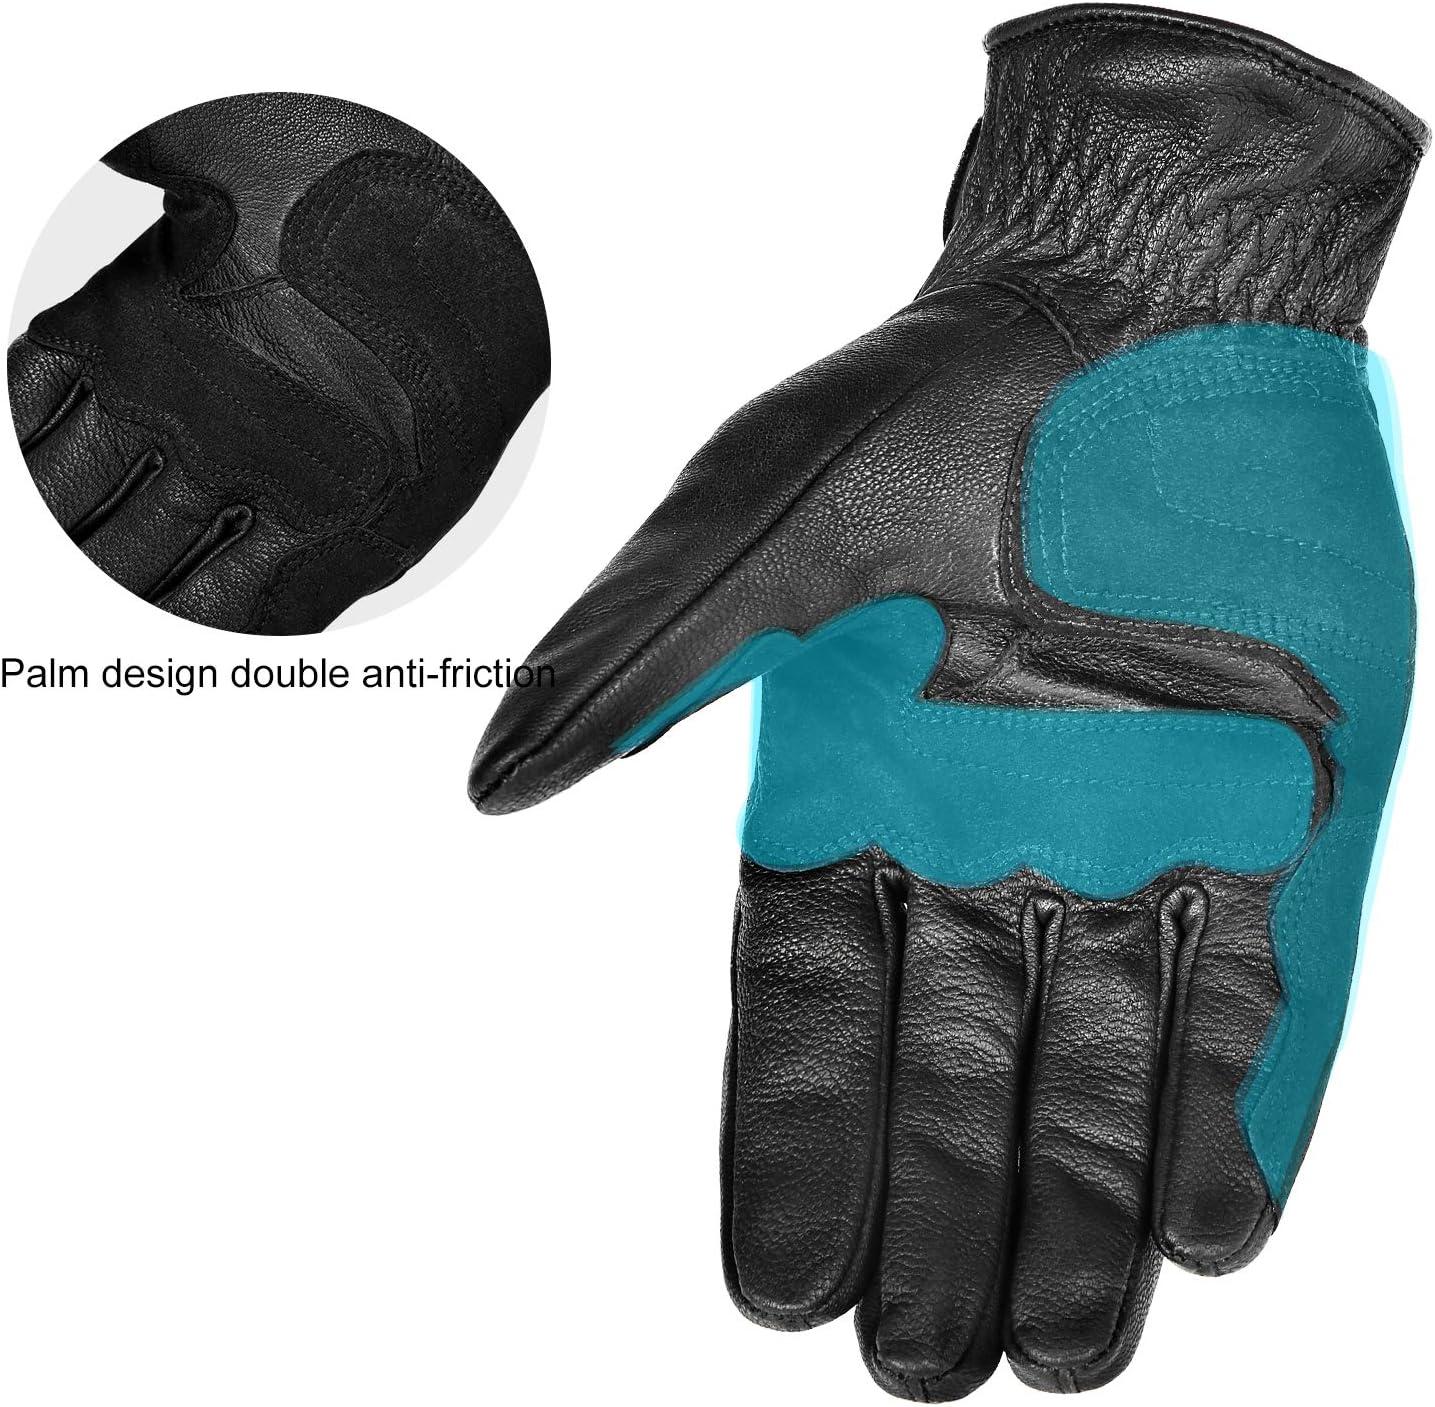 INBIKE Motorbike Gloves Mens Protection Motorcycle Leathers Black Full Finger All Season Touch Screen YKK Zipper Glove IM805